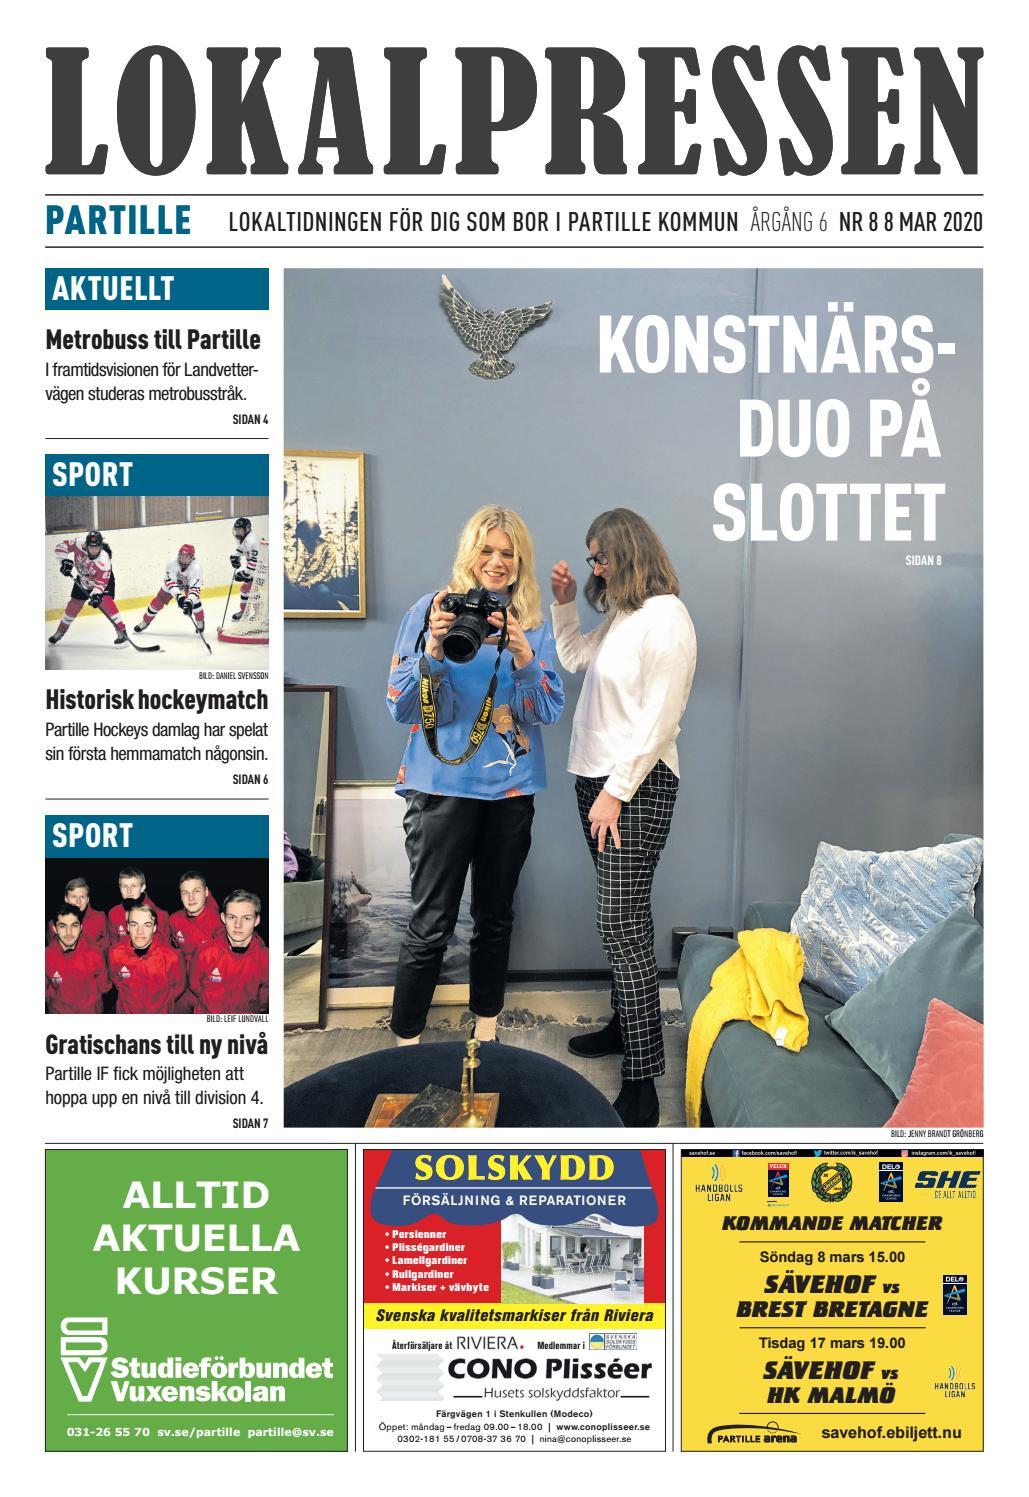 Seglarskolan & Trningsgruppen - lmans segelsllskap